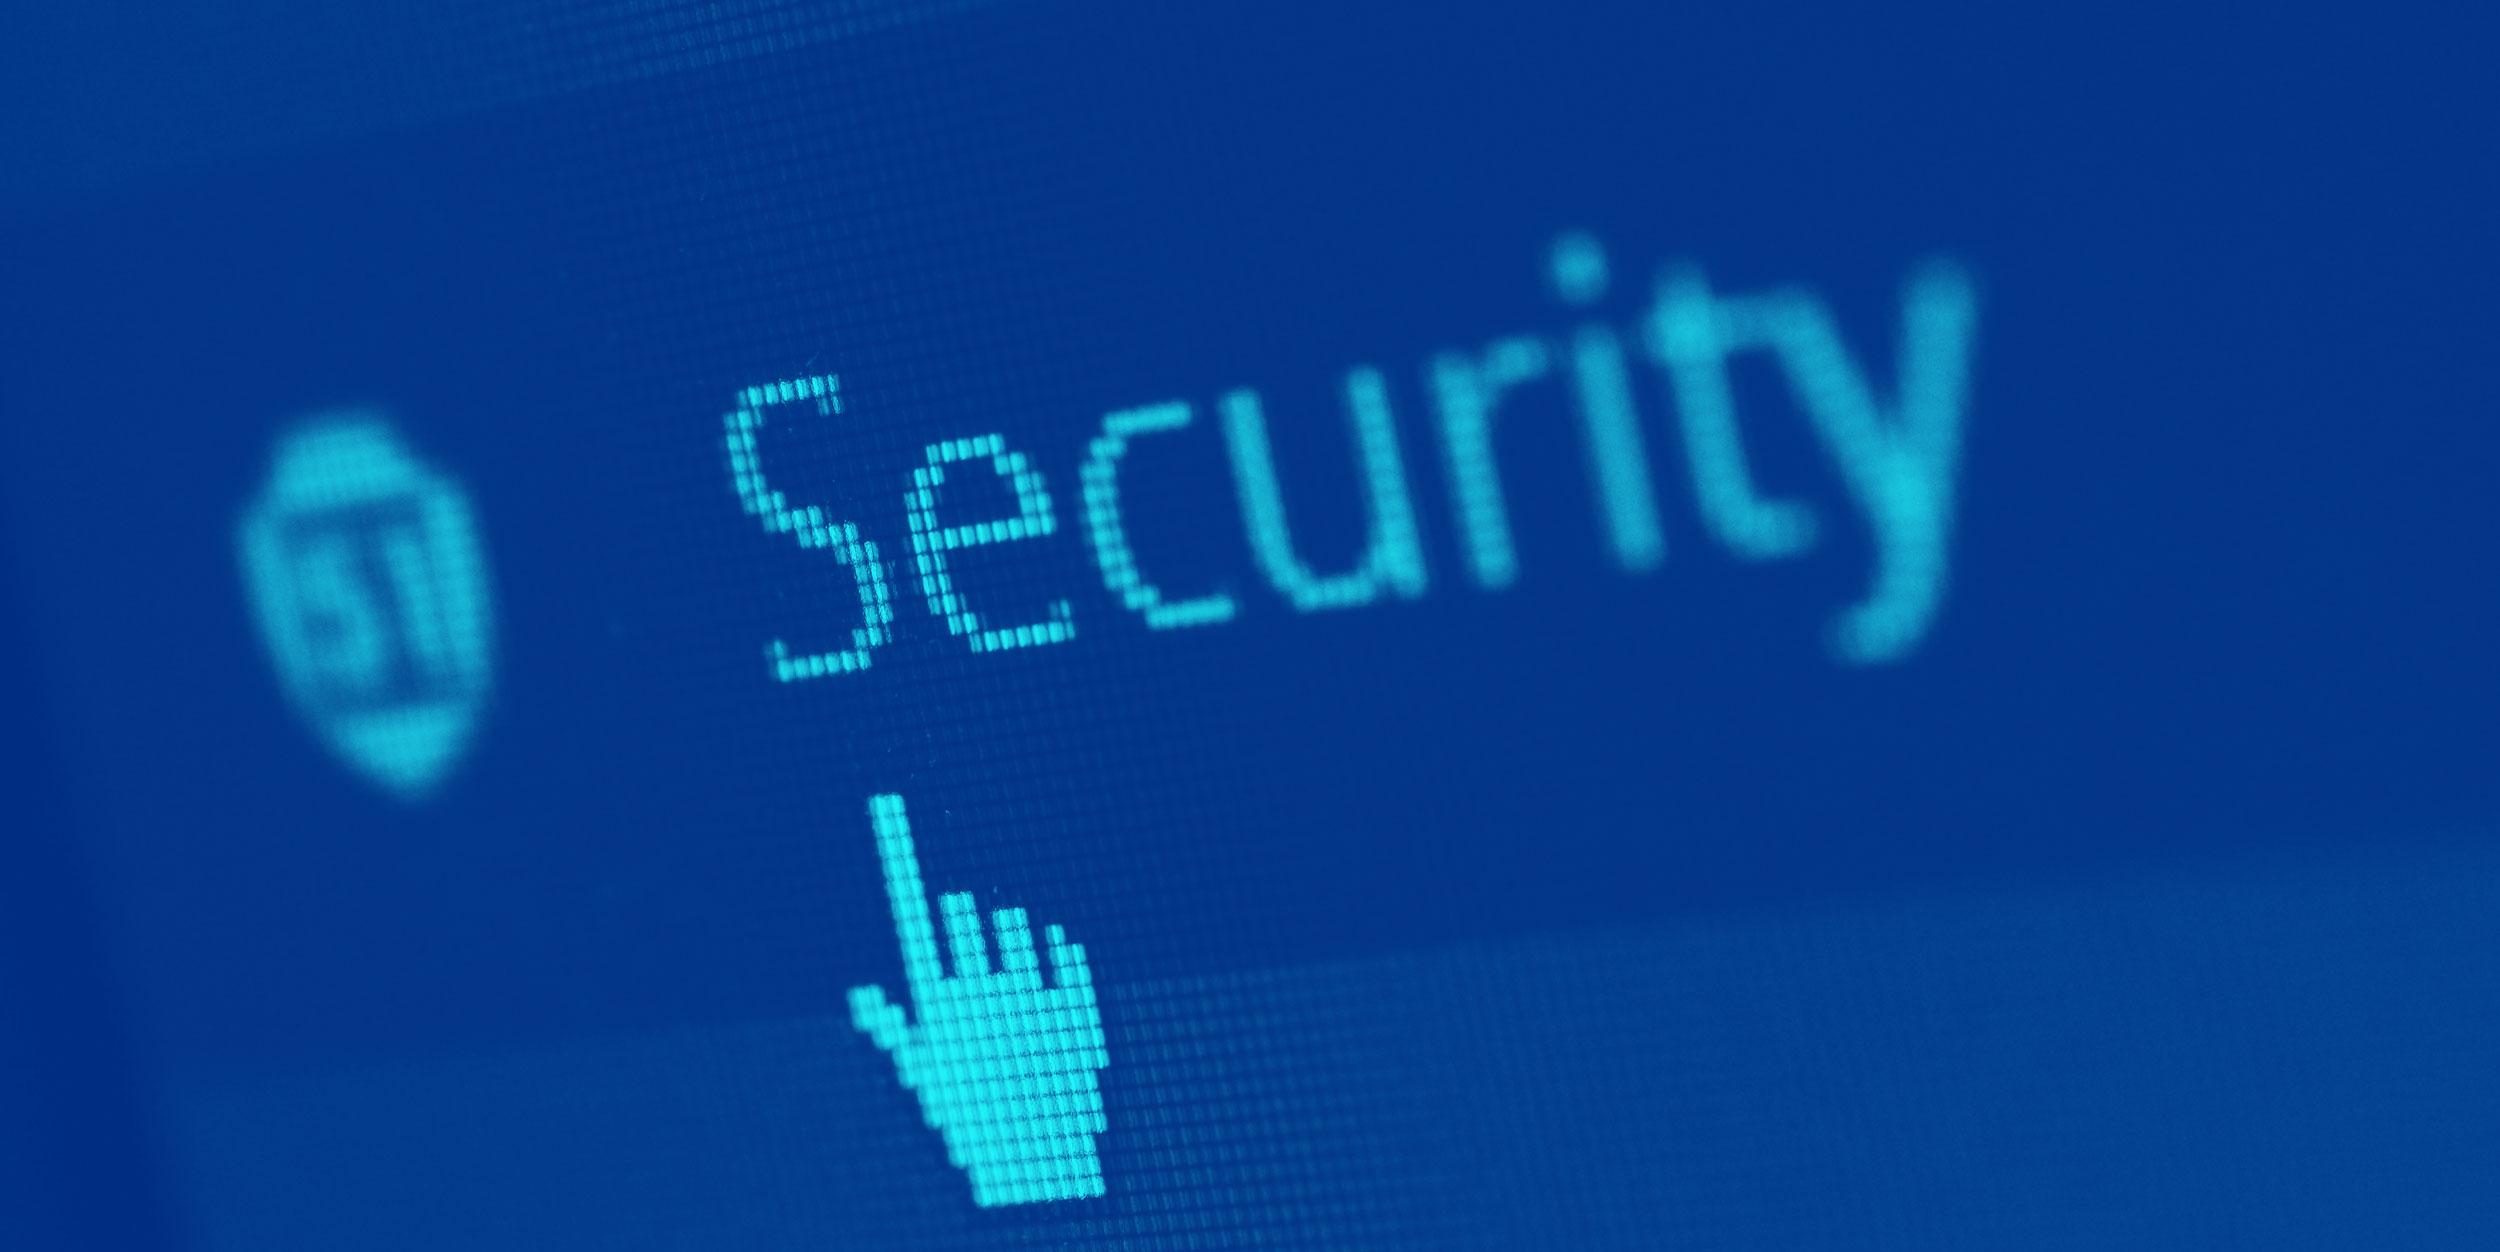 security_news_item.jpg